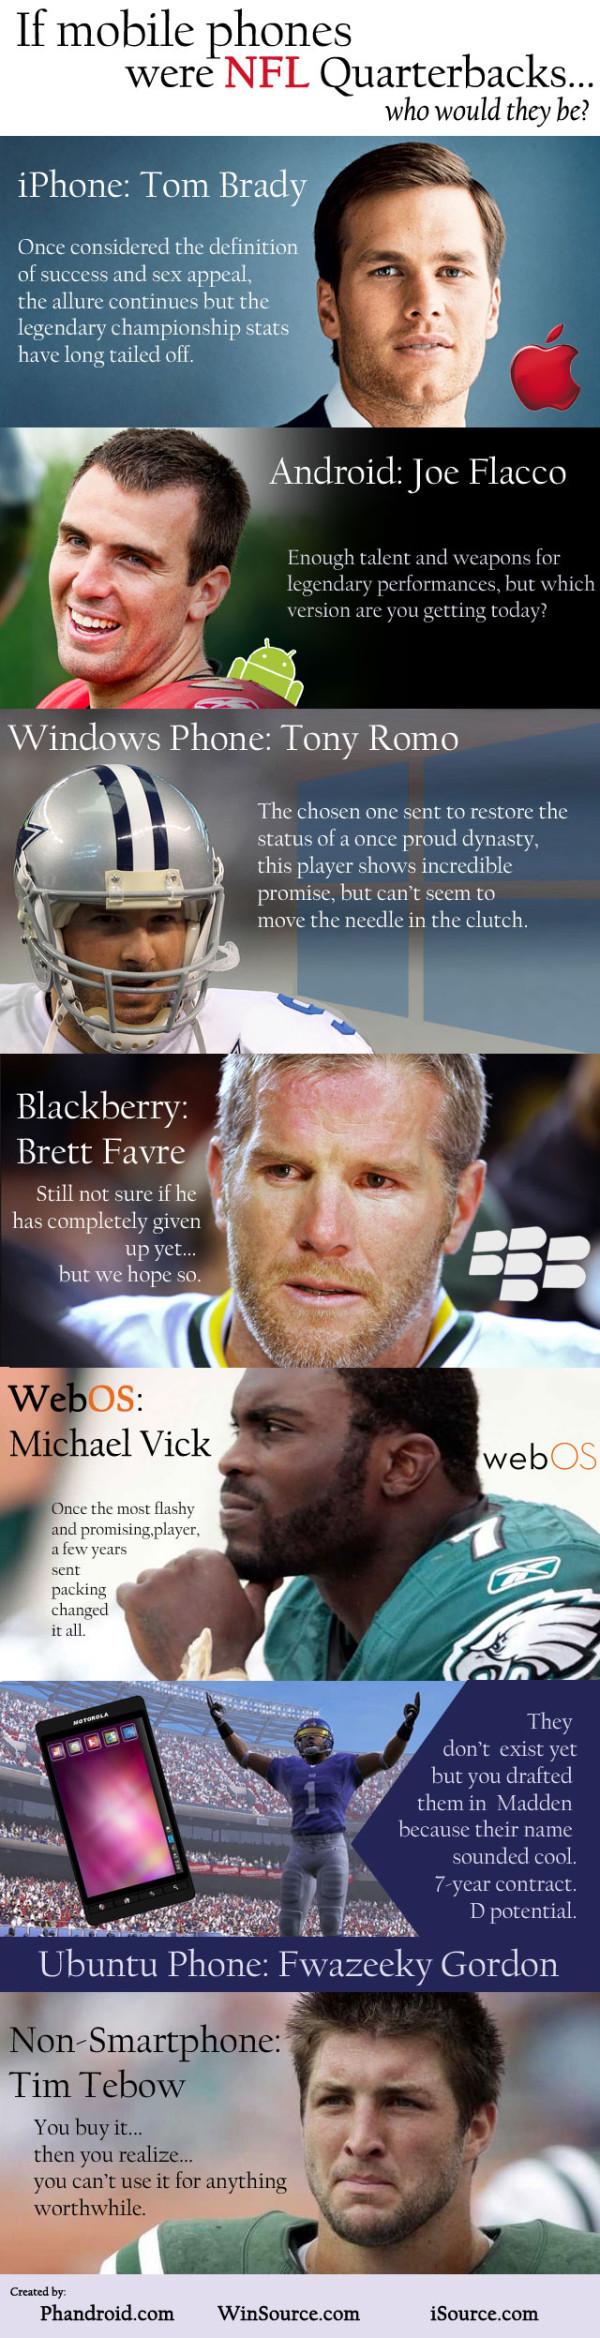 nfl-quarterbacks-mobile-phones